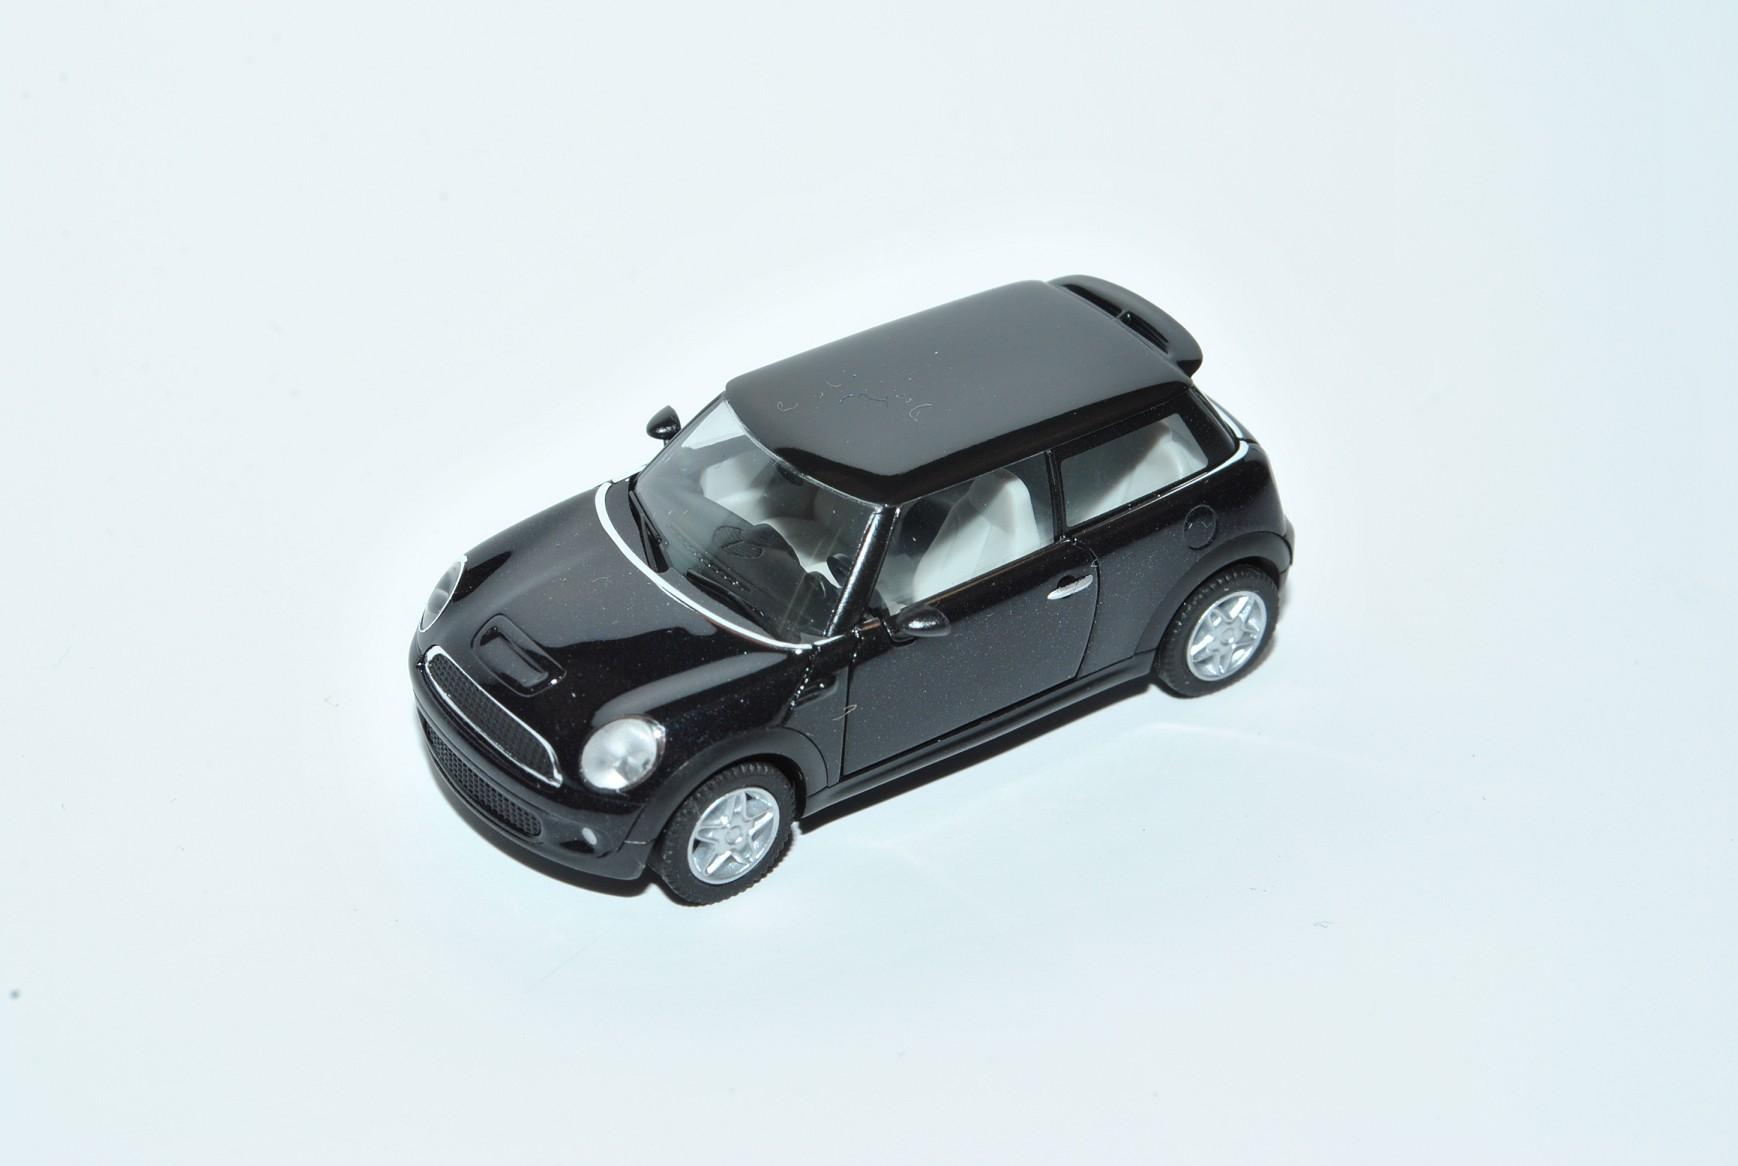 Mini-Cooper-F56-Schwarz-3-Tuerer-3-Generation-Ab-2014-H0-1-87-Herpa-Modell-Aut